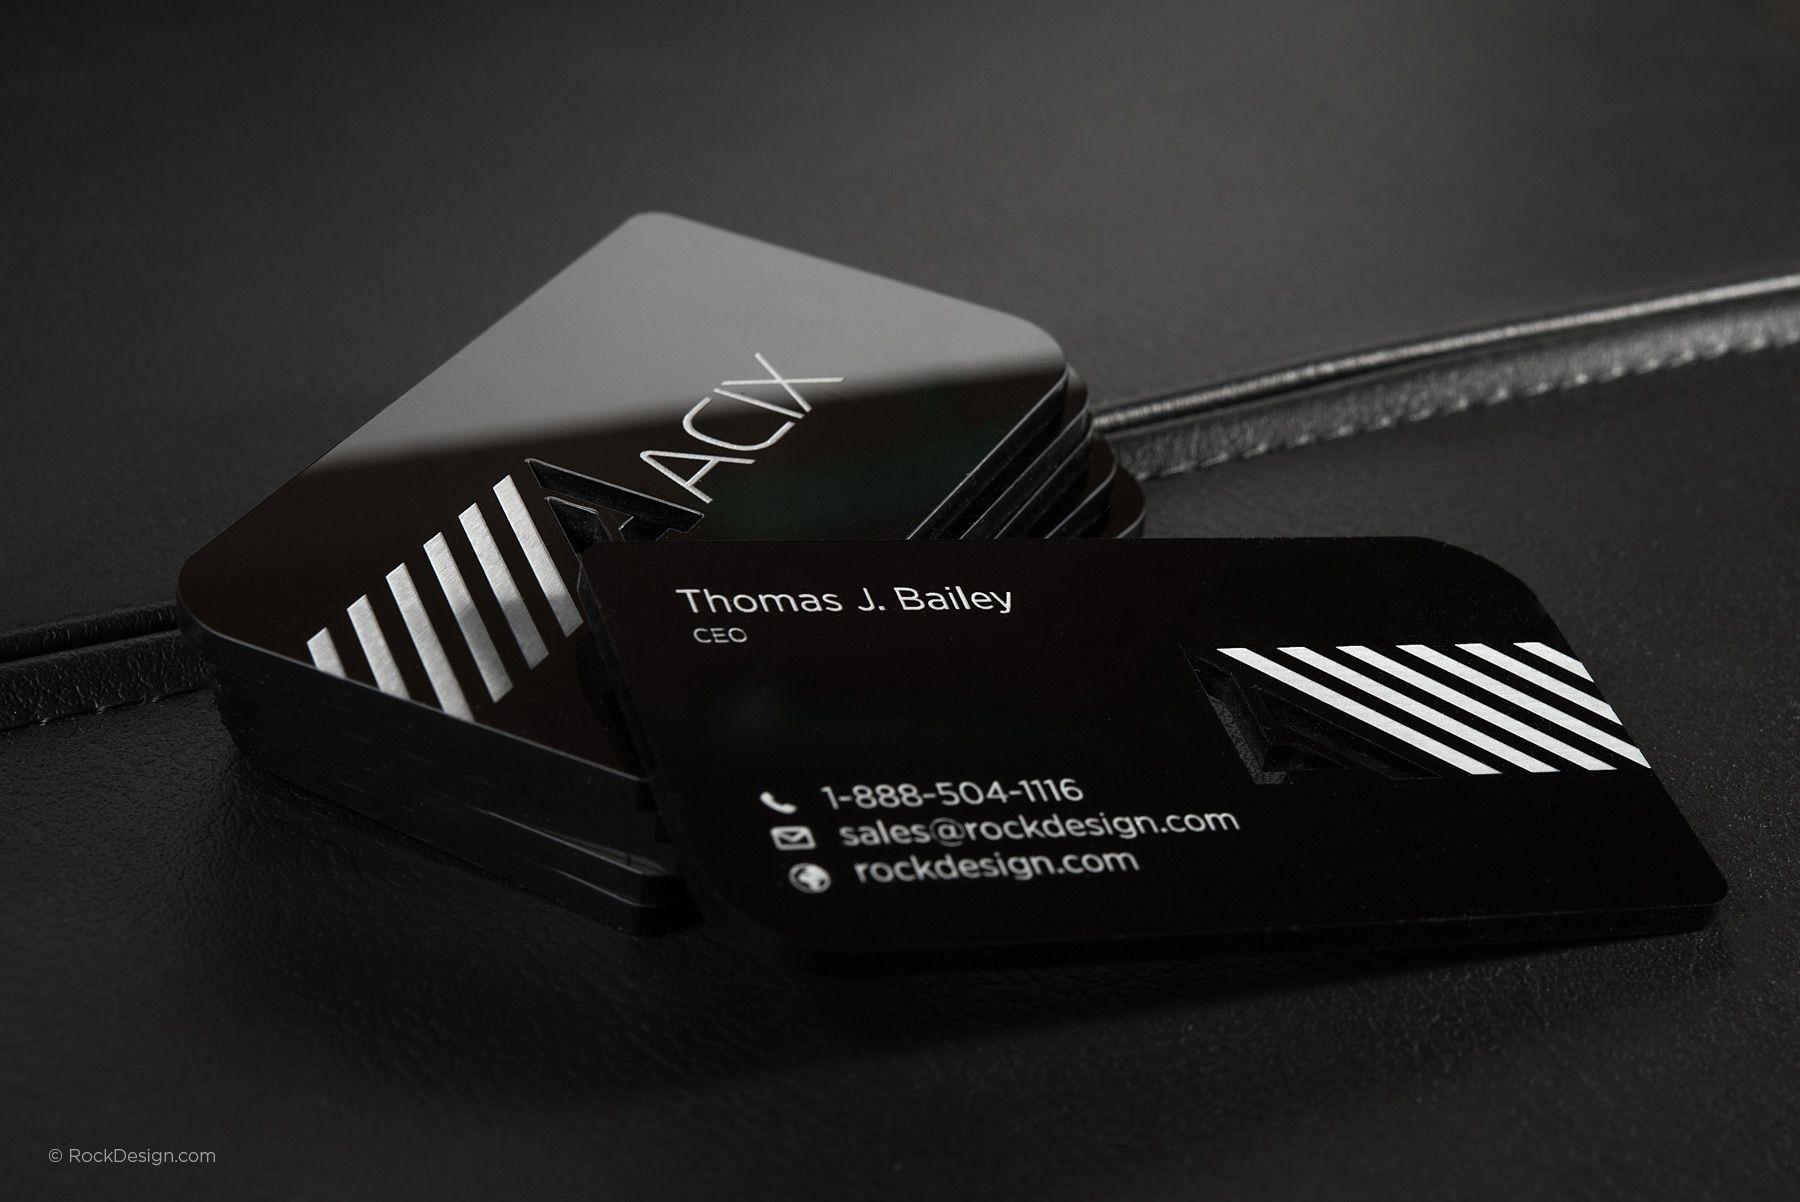 Acrylic business cards rockdesign luxury business card printing acrylic business cards rockdesign luxury business card printing reheart Images